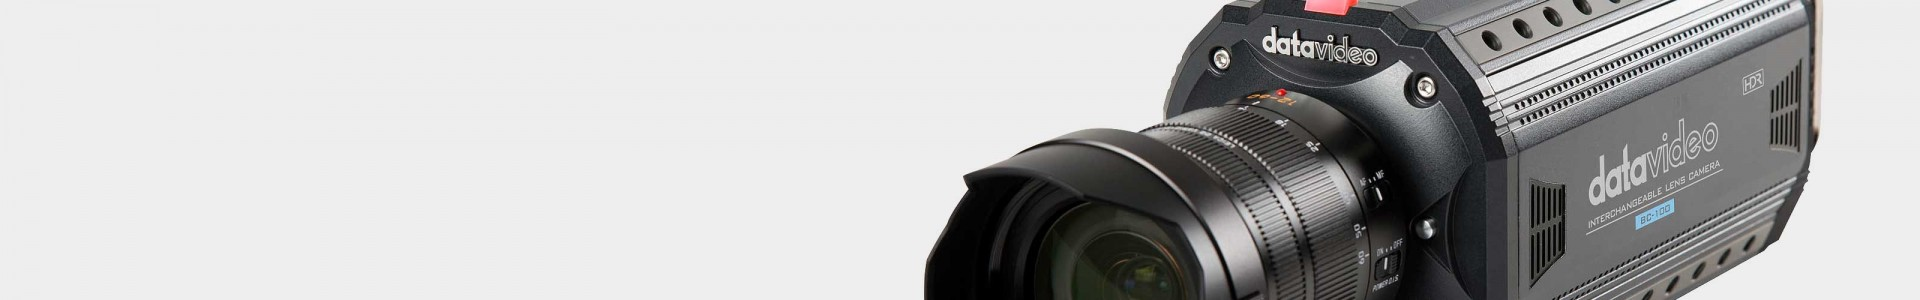 Cámaras de vídeo Datavideo - Cámaras PTZ y POV - Avacab